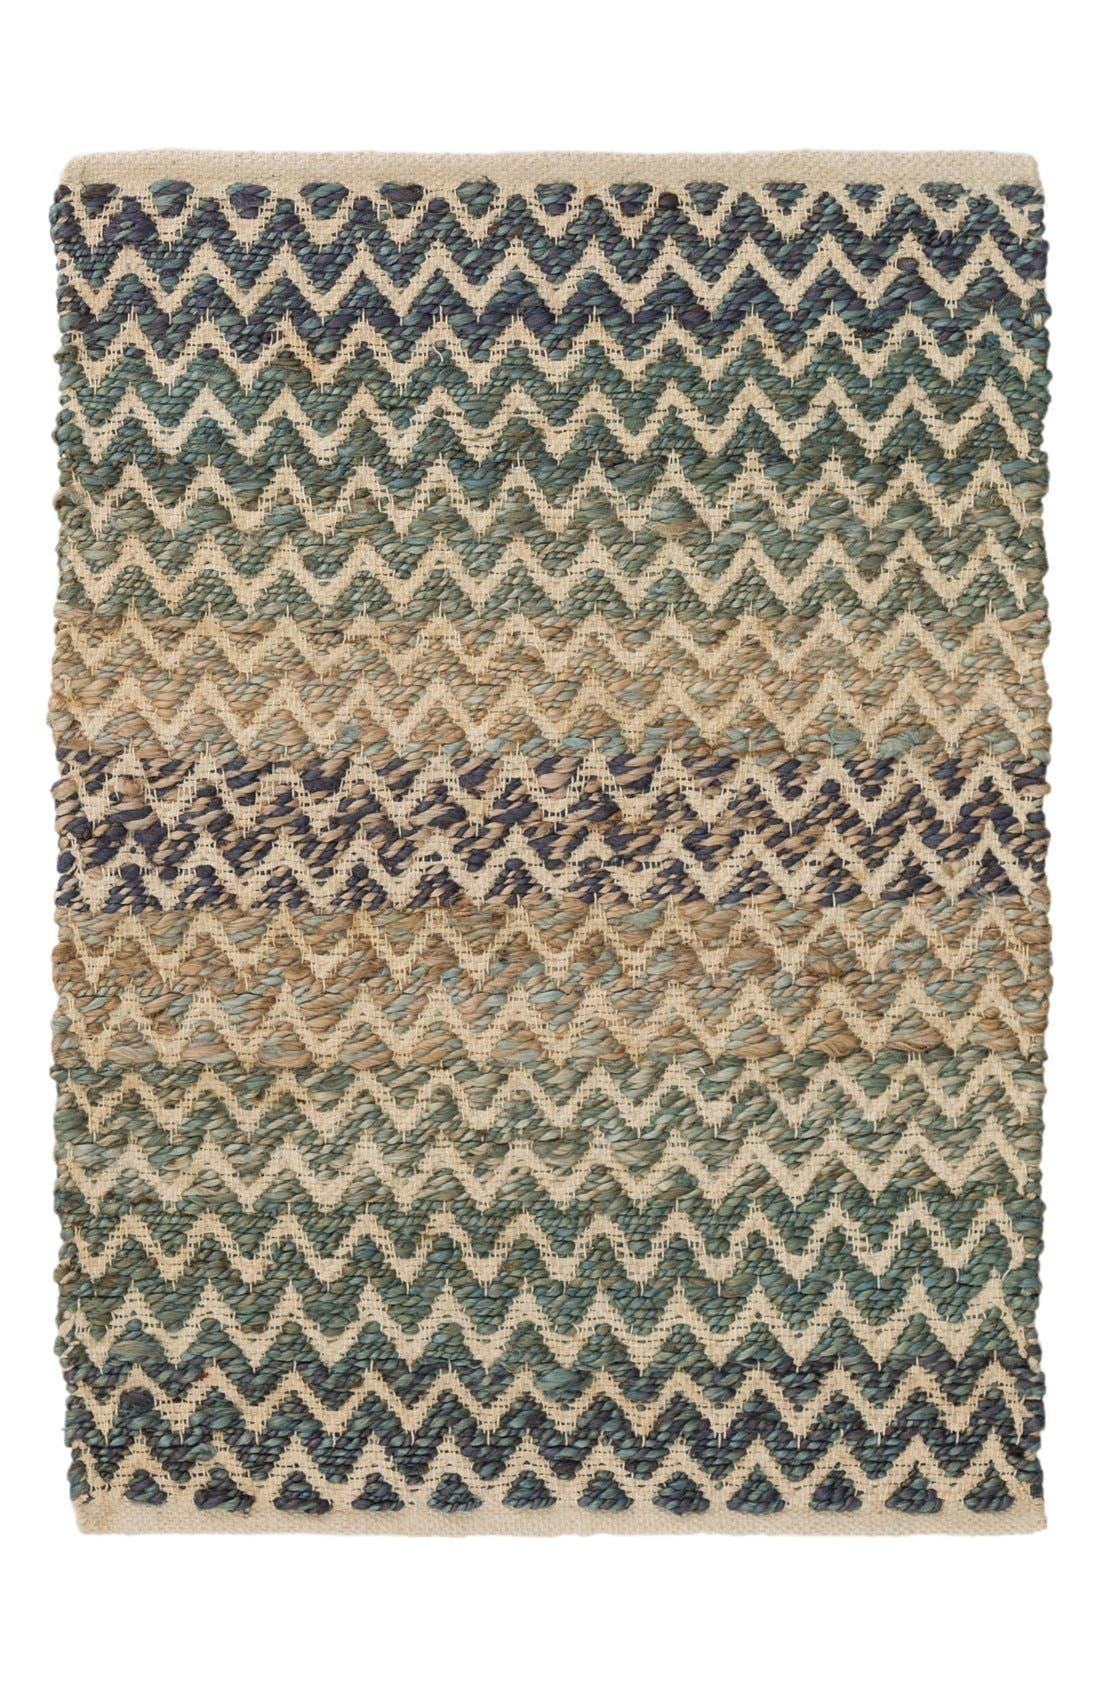 Cousteau Handwoven Rug,                             Main thumbnail 1, color,                             300